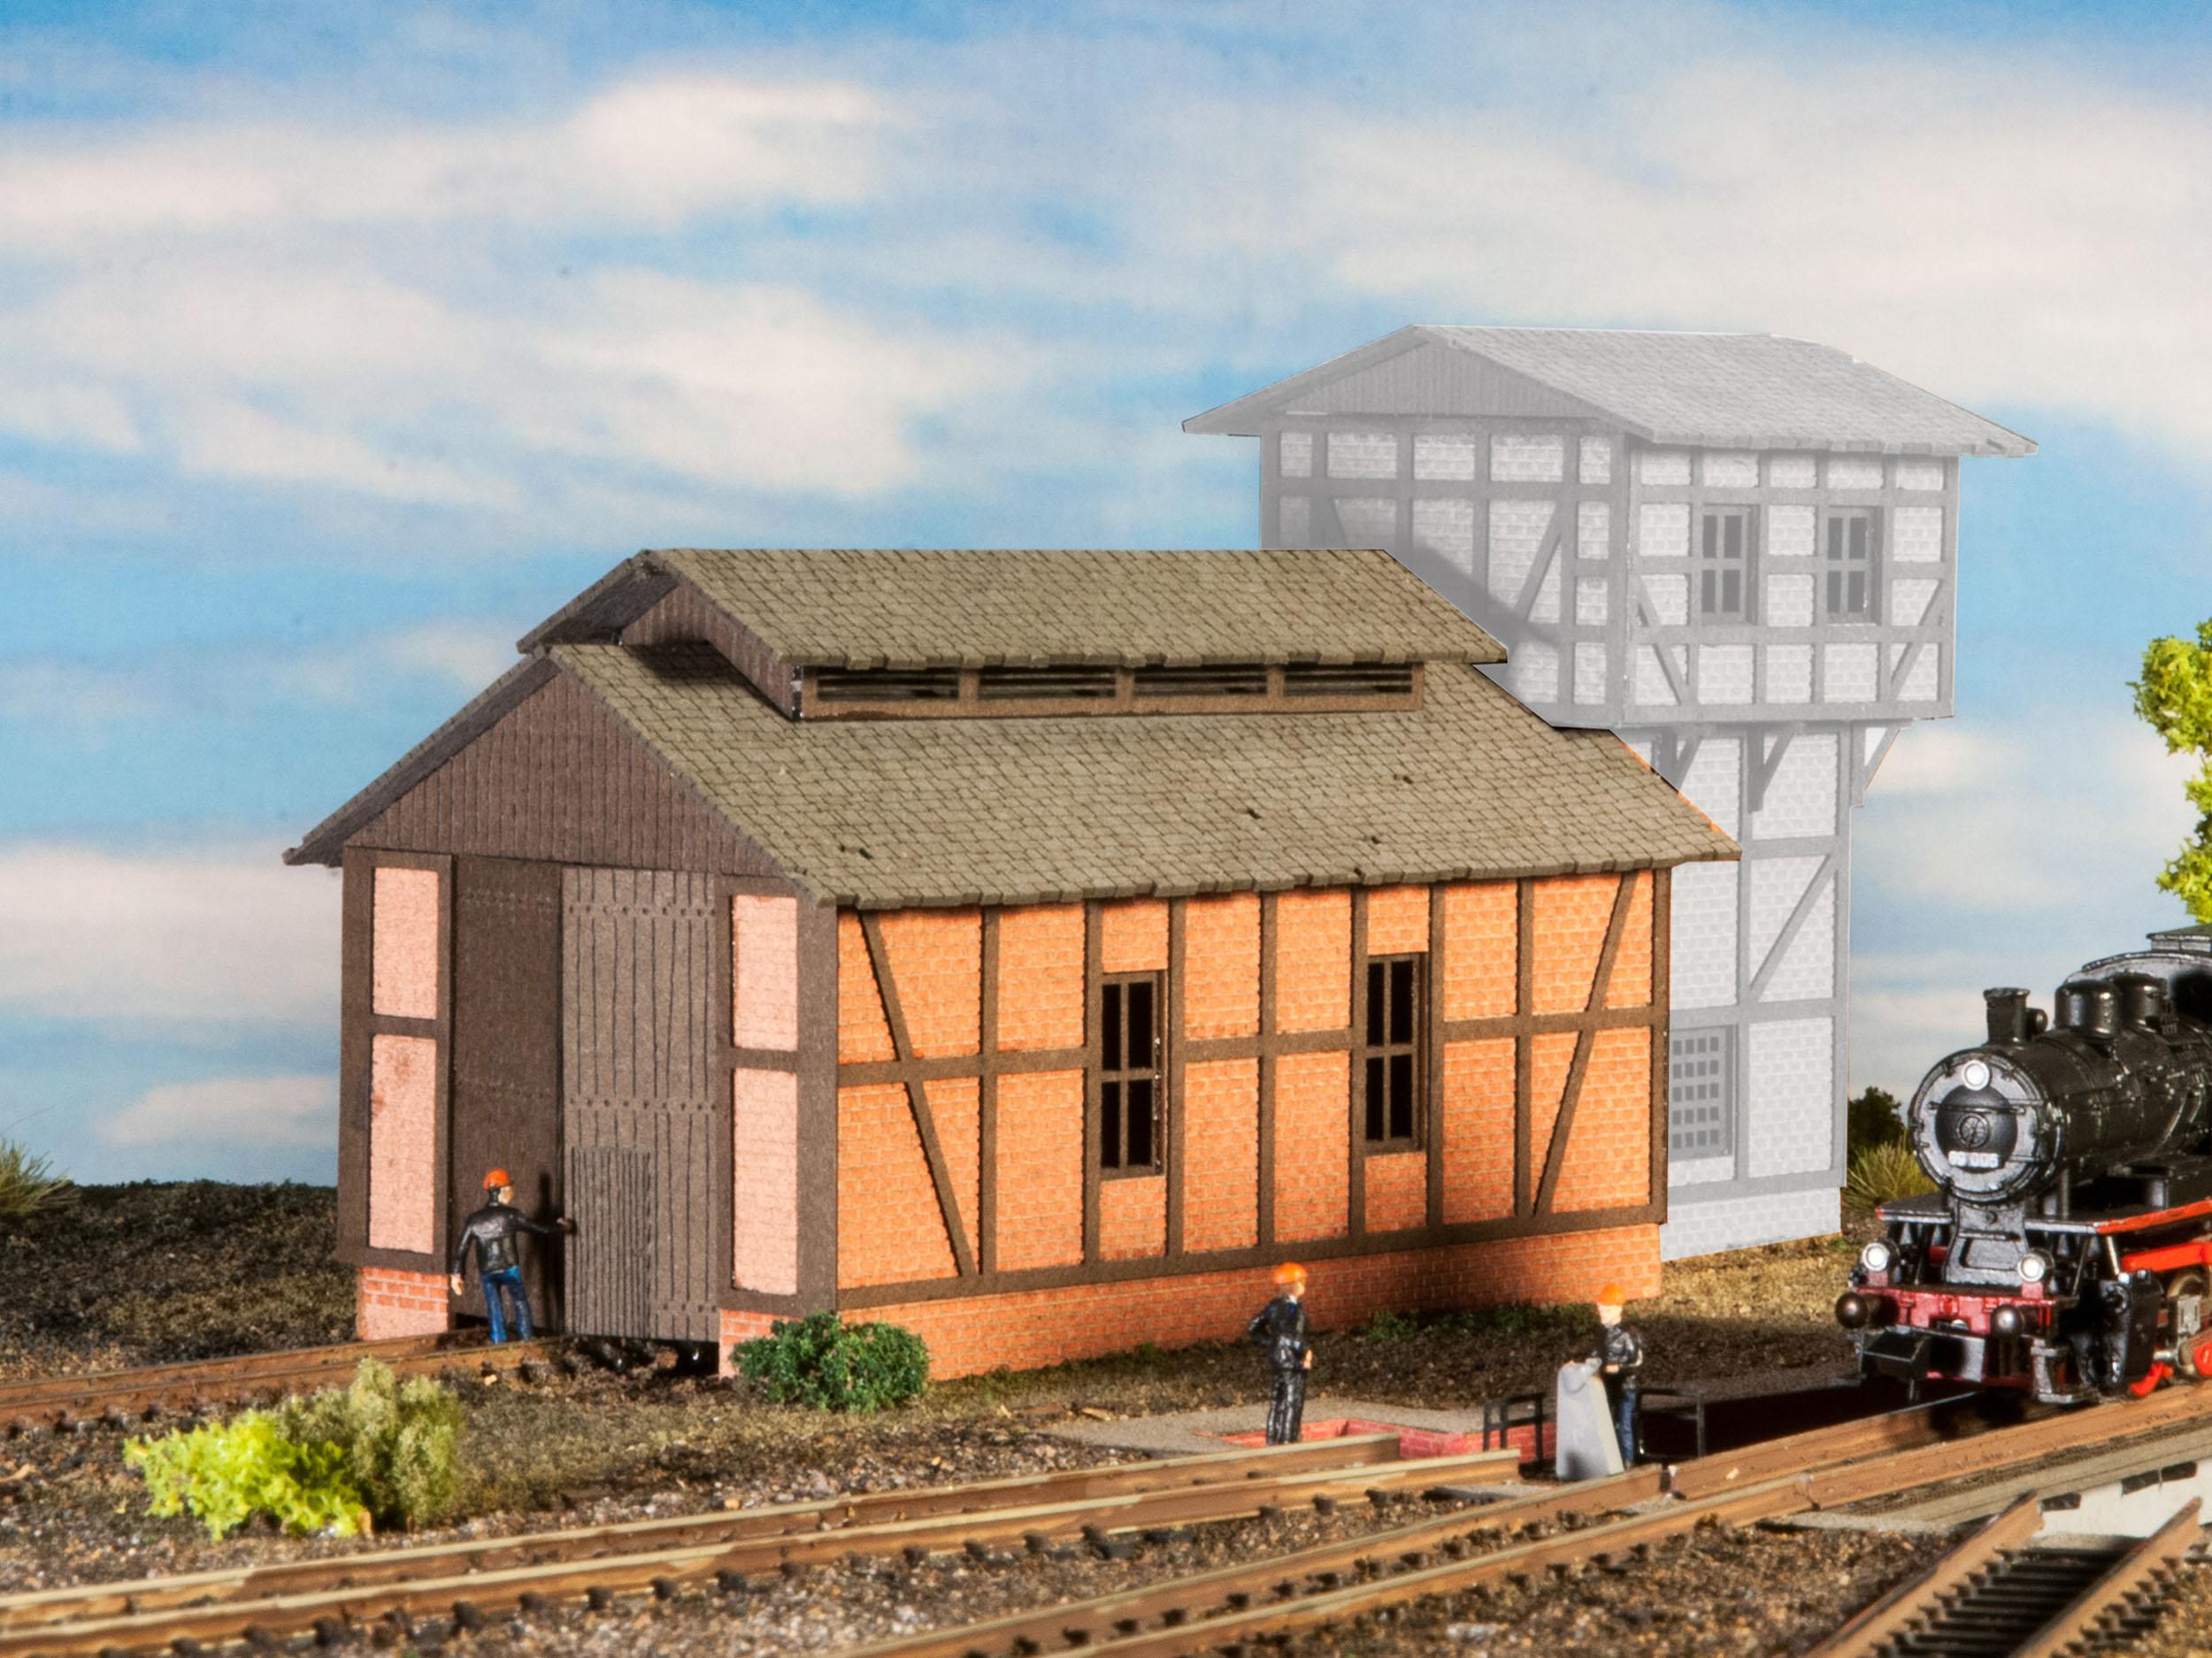 dailymall 20pcs Modellb/äume Tisch B/äume Modellbau Modellbahn Landschaftsmodell Landschaften Miniatur-Ornament-Set